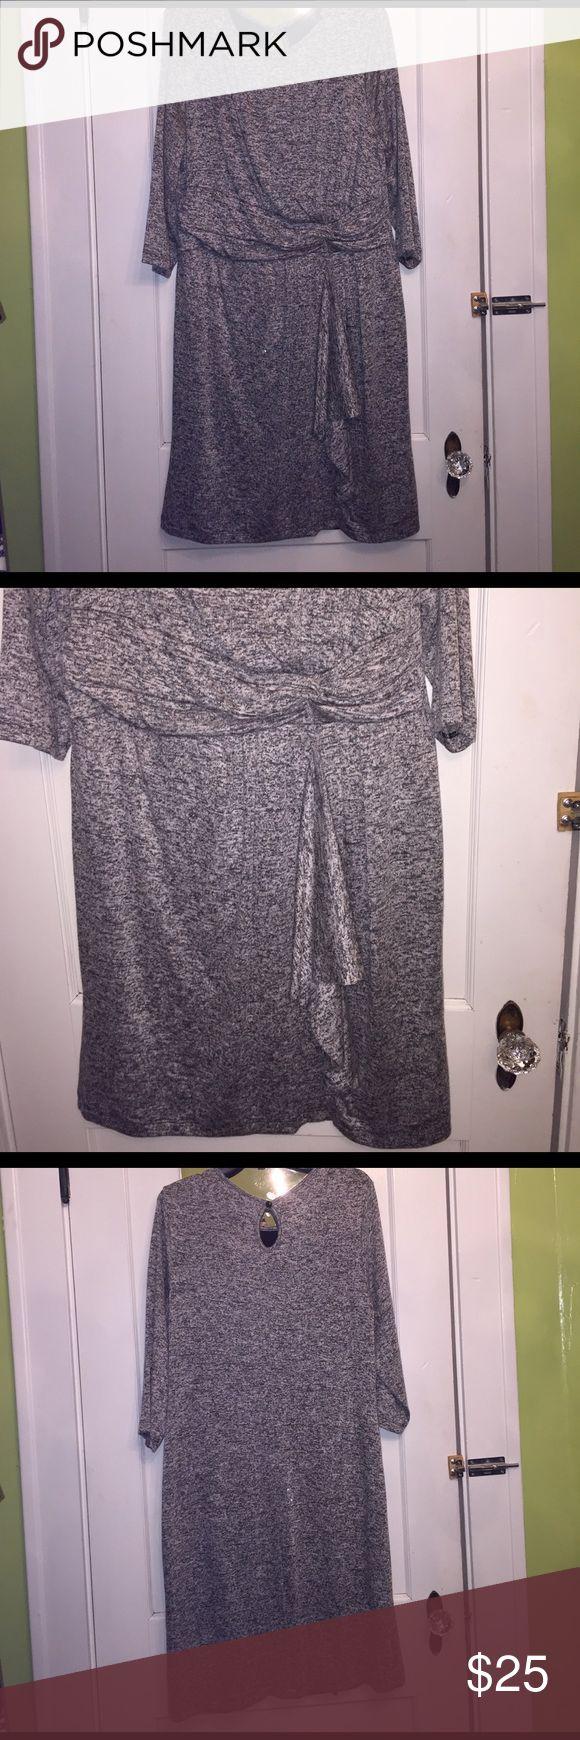 Ashley Stewart Heather Gray Dress Sz 18/20 Ashley Stewart Heather Gray Dress Sz 18/20. Worn once. Excellent Condition. Ashley Stewart Dresses Midi